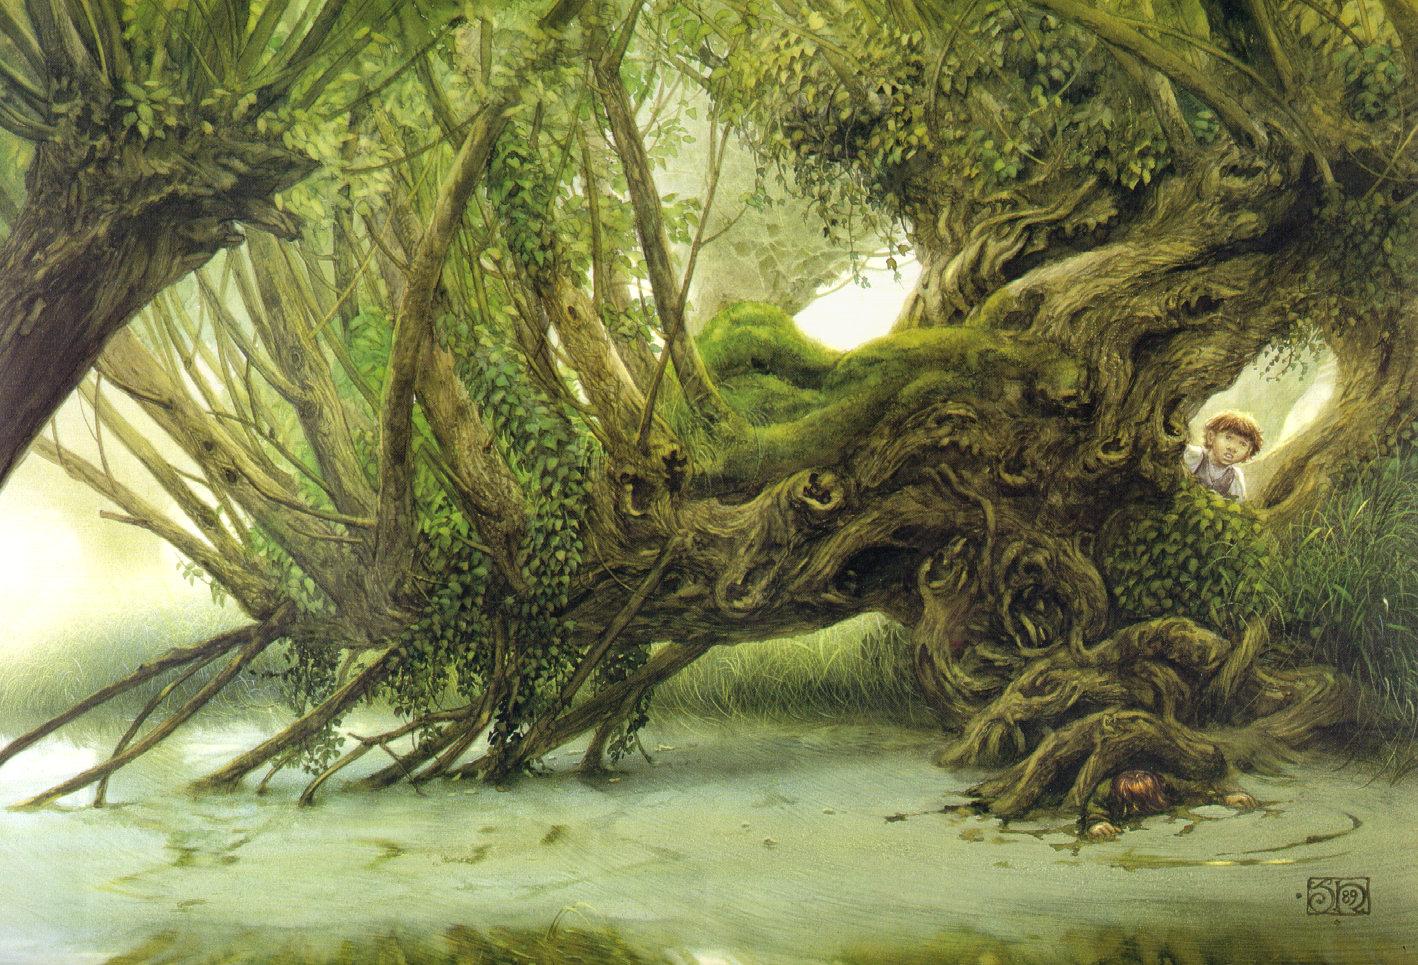 John Howe S Illustration J R R Tolkien Photo 34059968